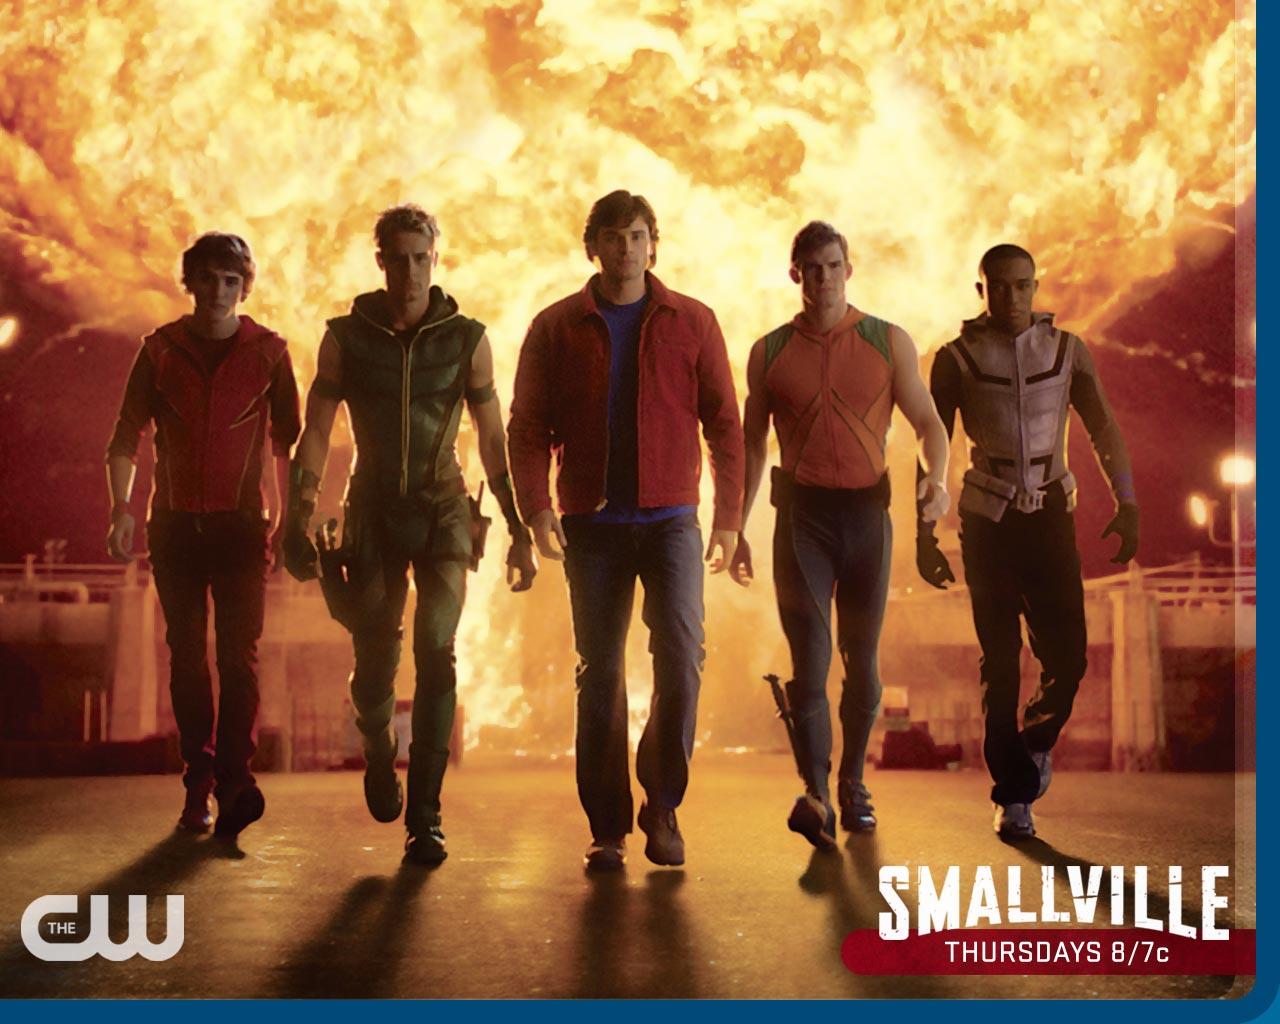 http://3.bp.blogspot.com/_FX4NsT2W5VI/TSzt8m6f9mI/AAAAAAAAAPw/h56eY0GIlck/s1600/Smallville-Cast-Justice.jpg